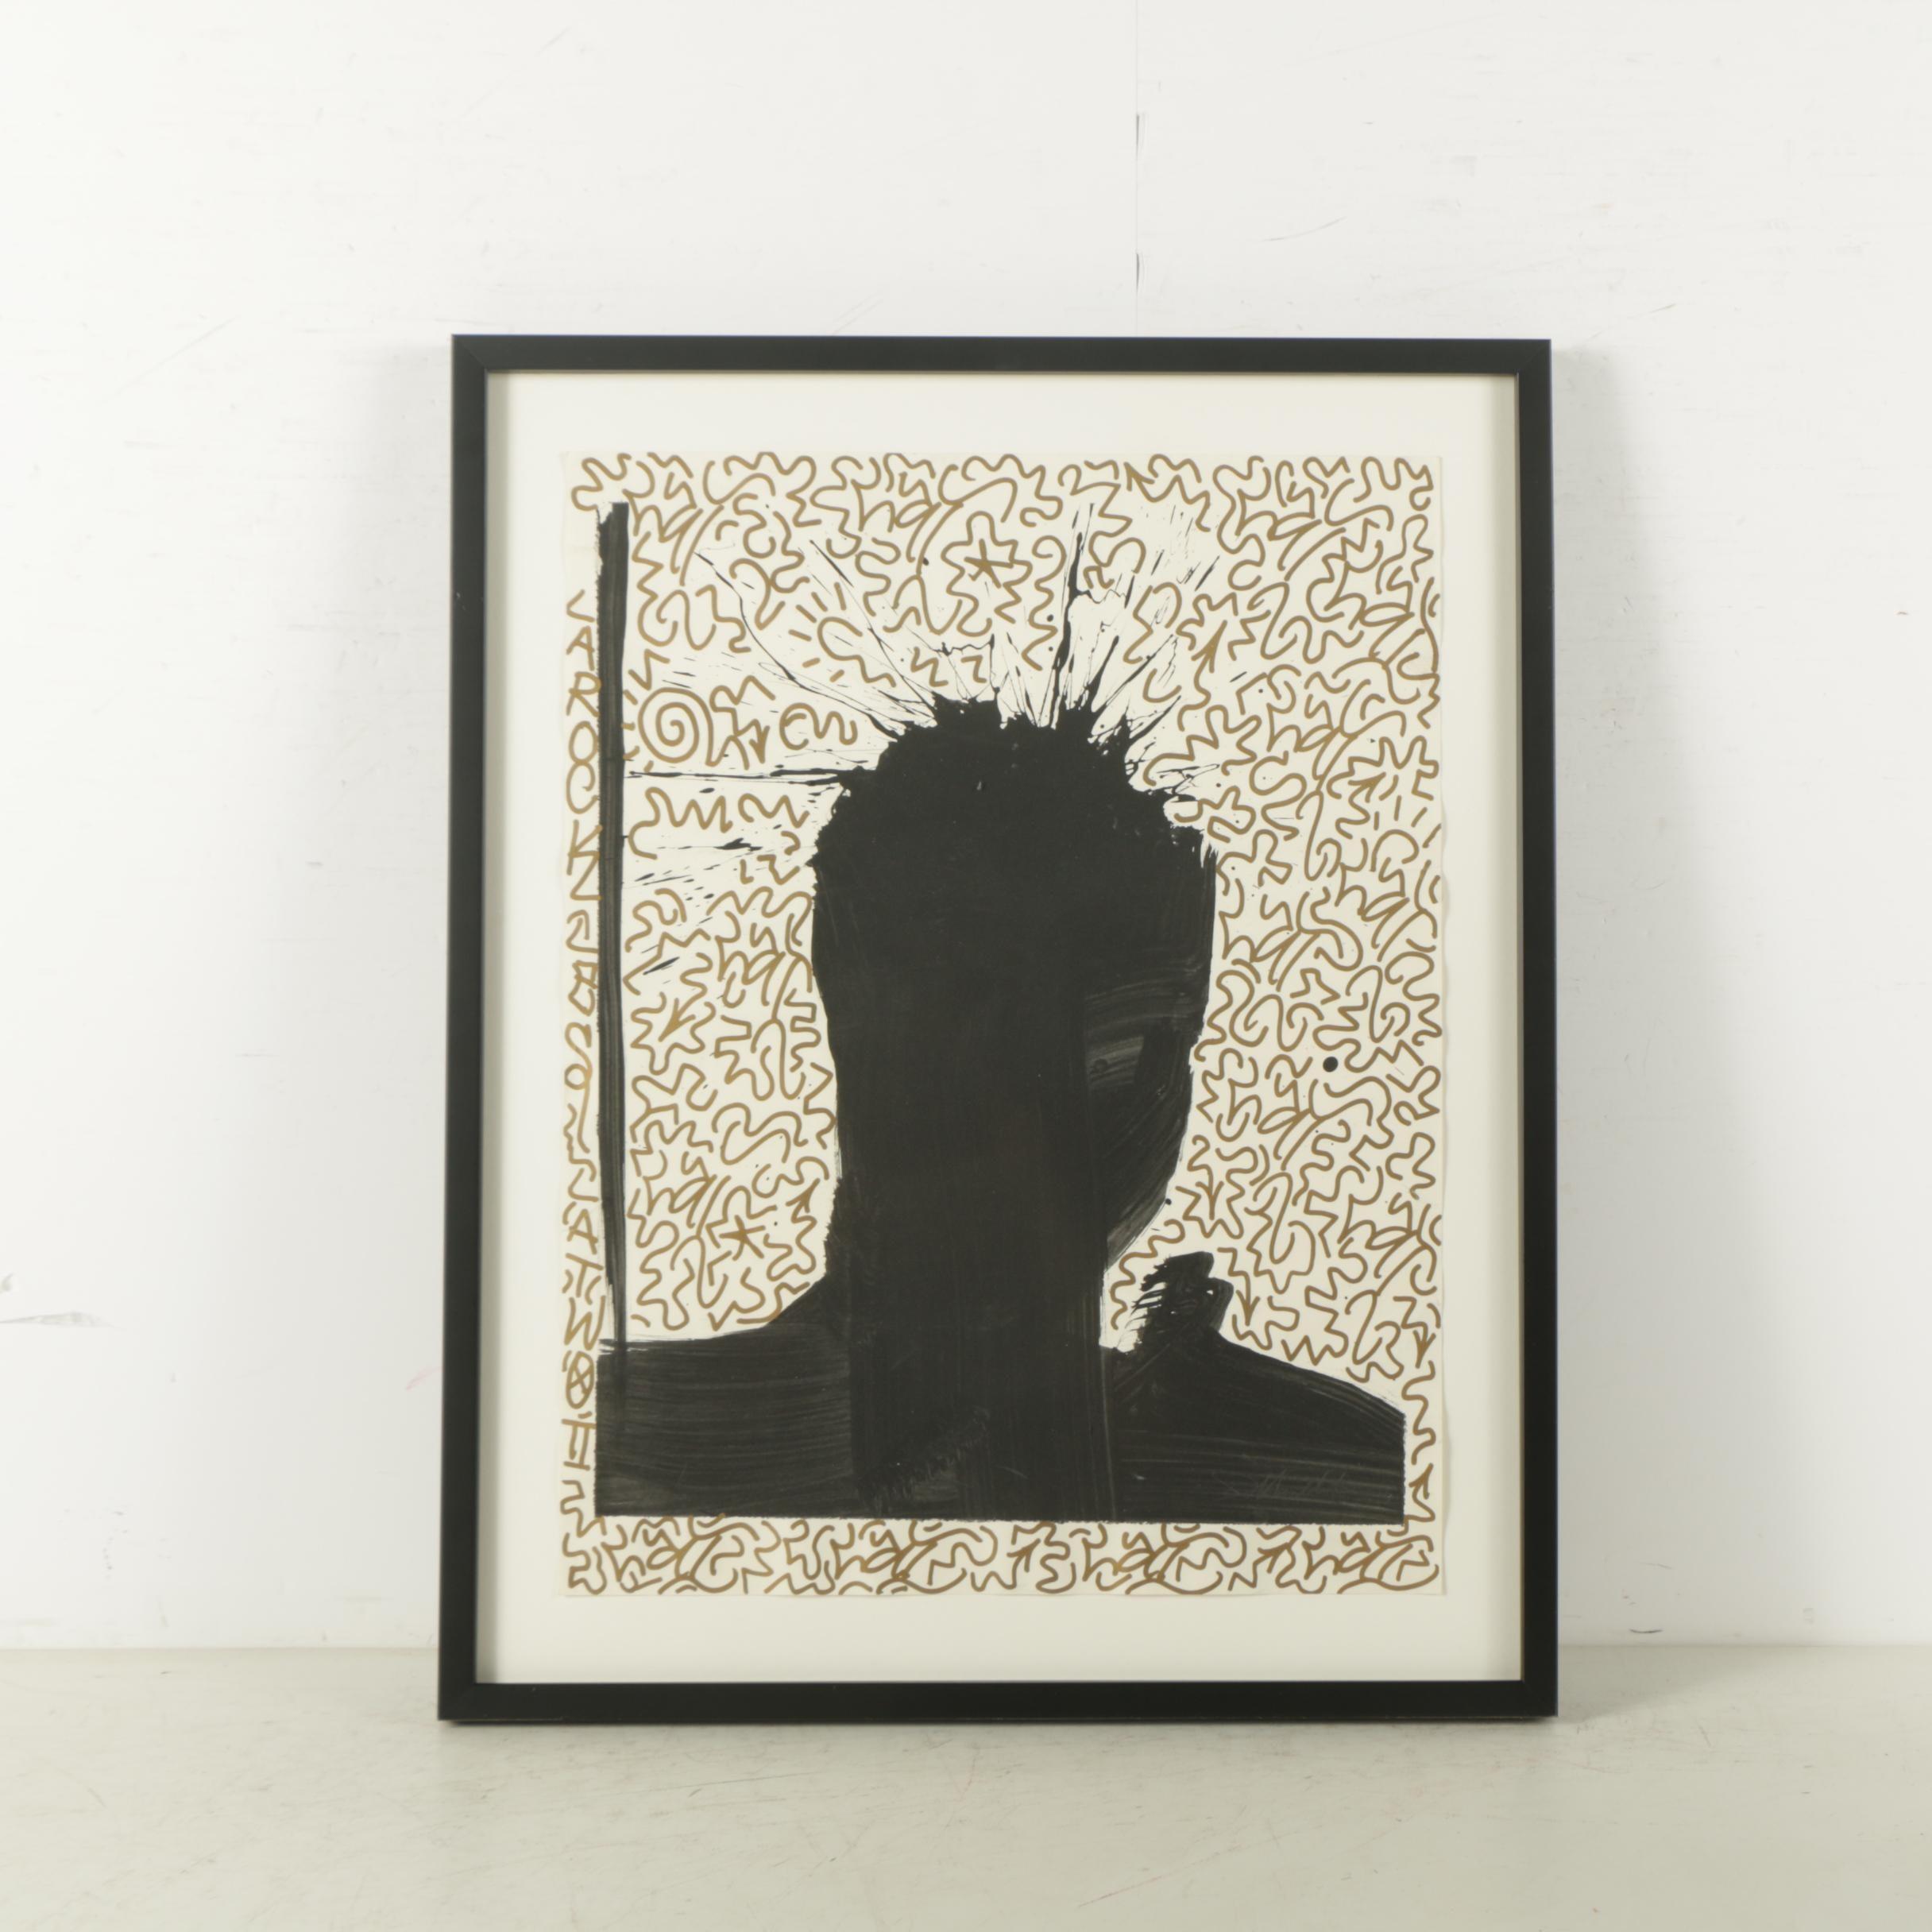 "LA II (Angel Ortiz) and Richard Hambleton Ink on Paper ""Untitled (Shadow Head)"""